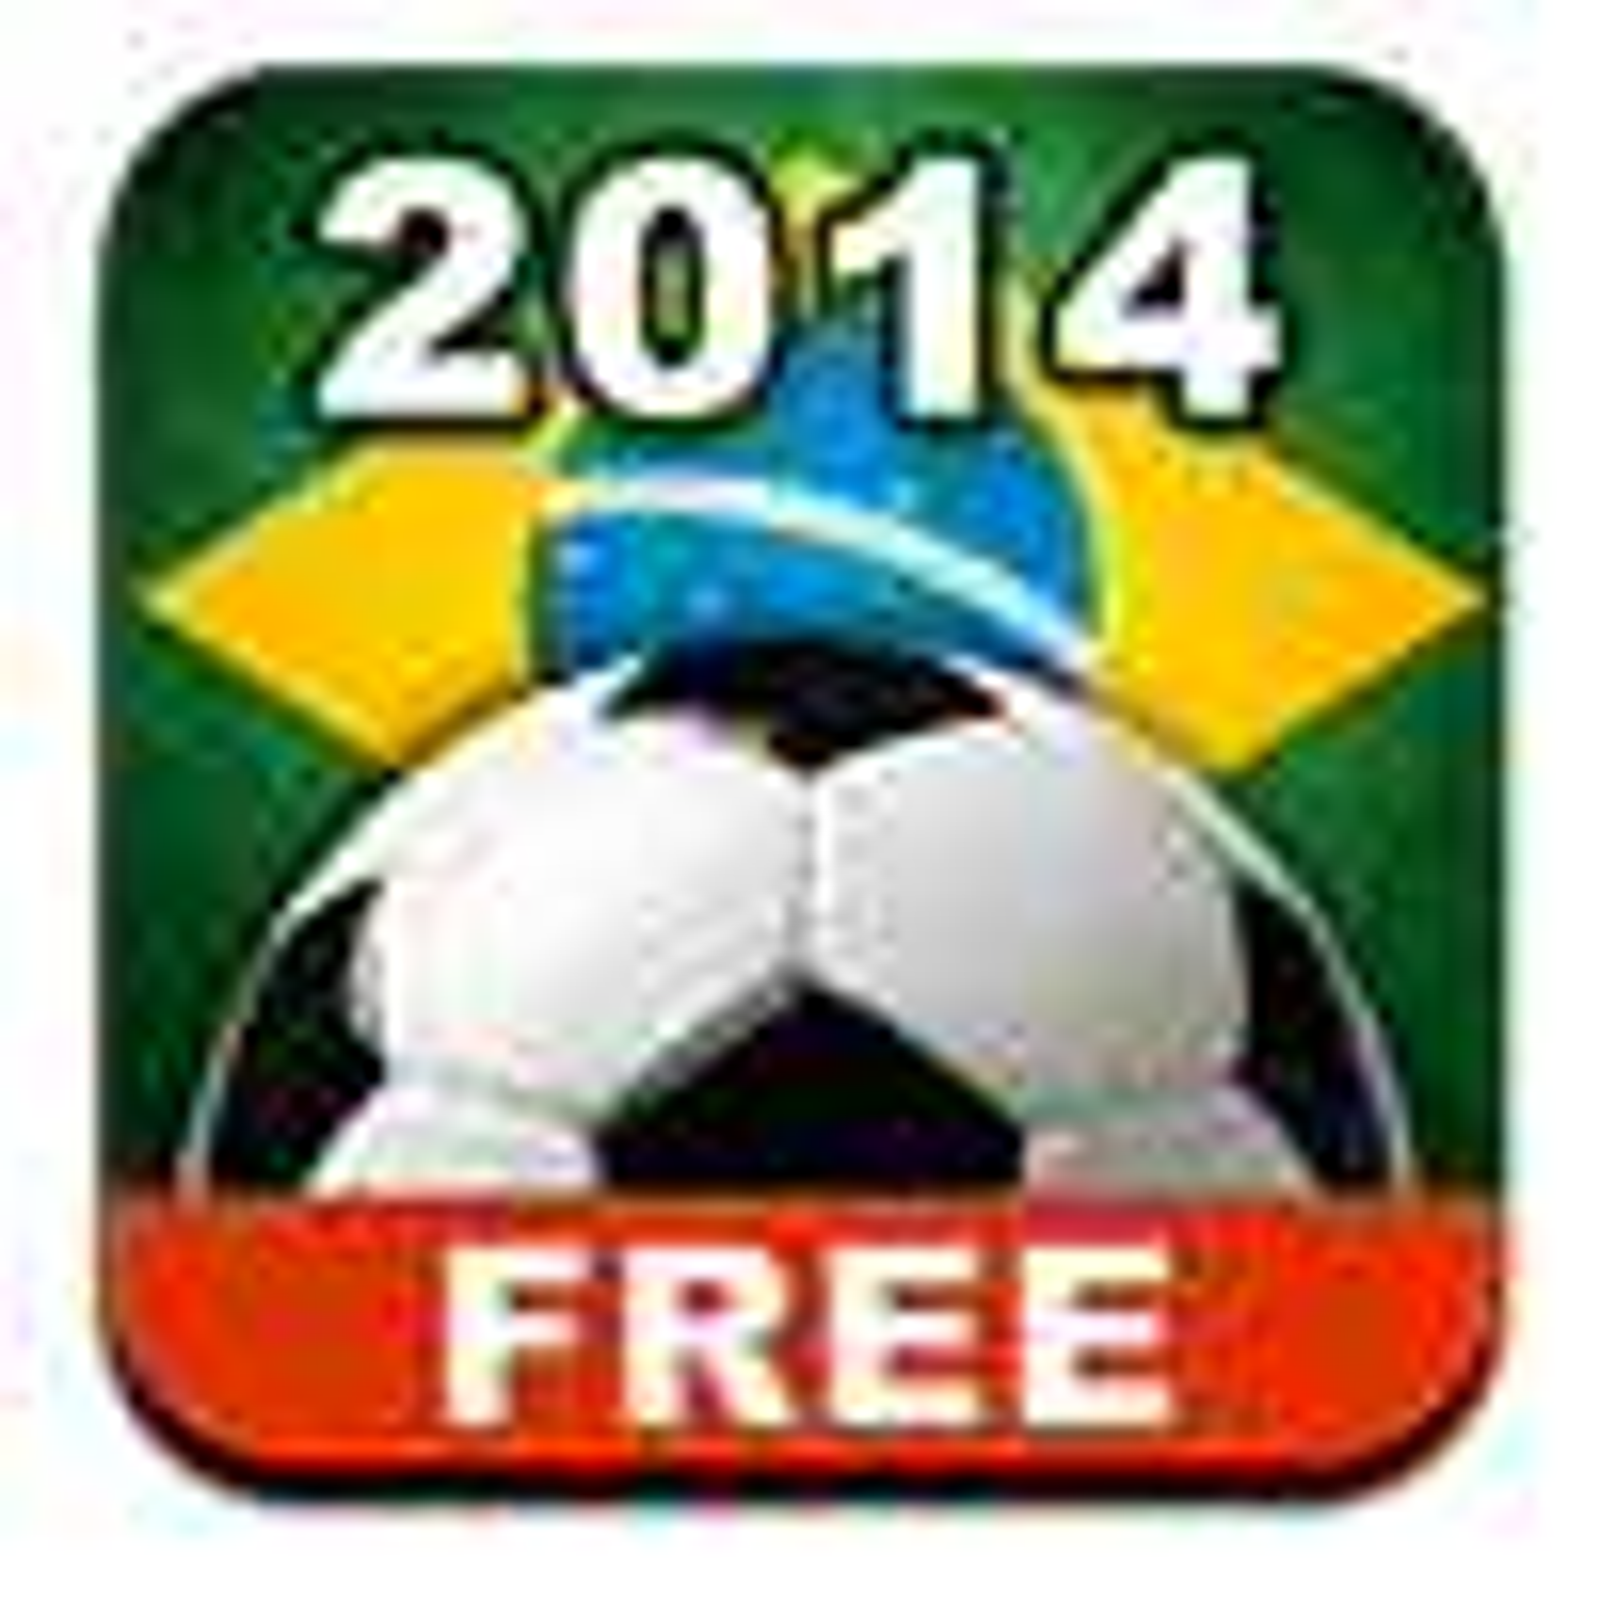 iCup 2014 FREE - Brazil 1.4